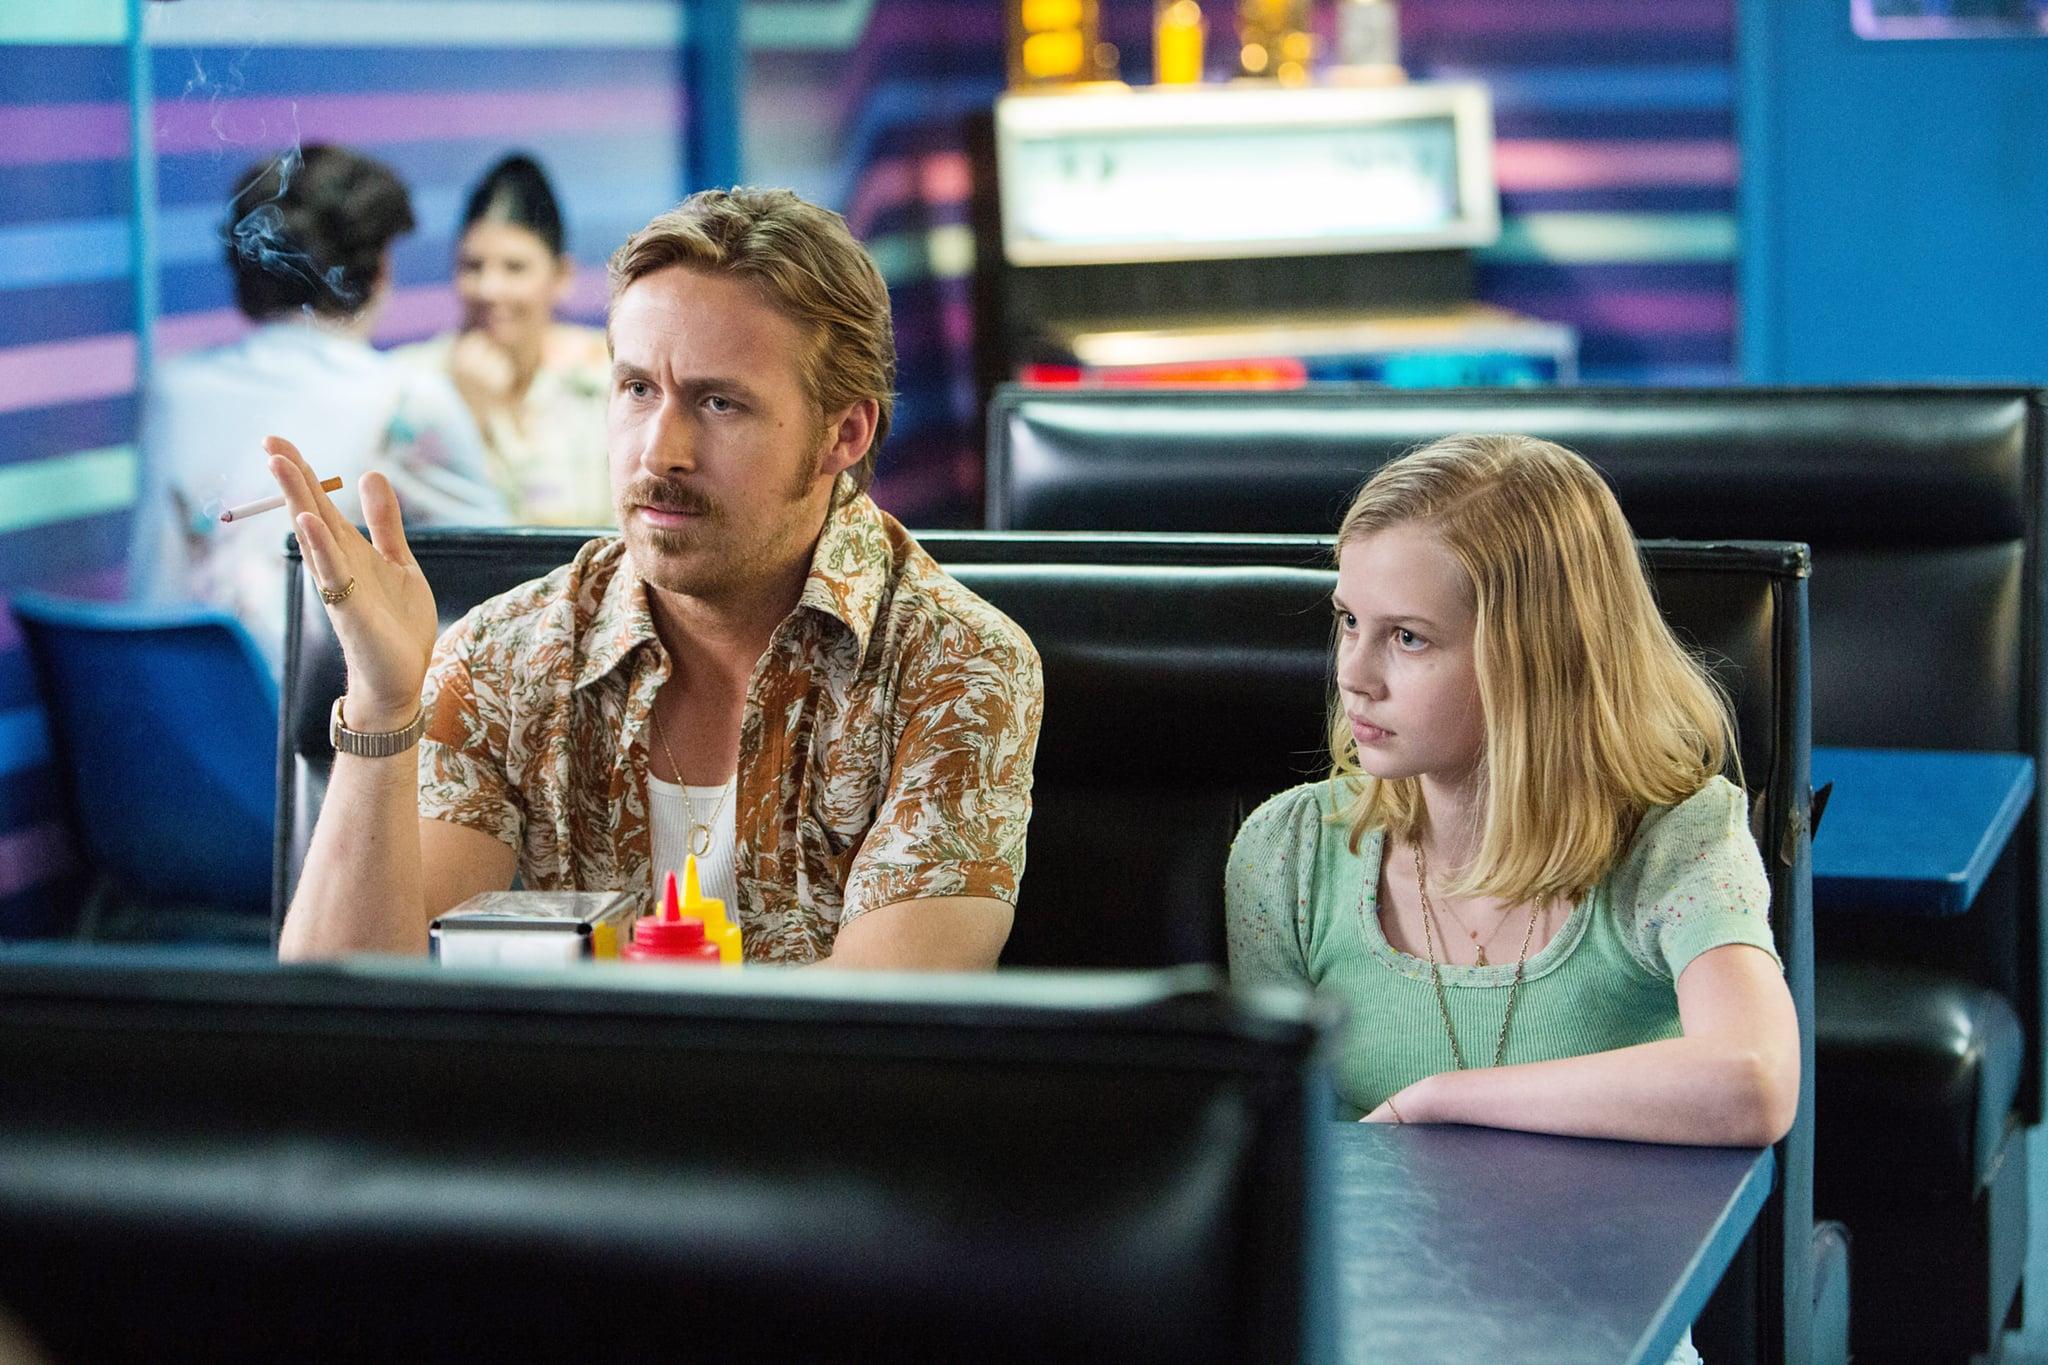 THE NICE GUYS, from left: Ryan Gosling, Angourie Rice, 2016. ph: Daniel McFadden /  Warner Bros. / courtesy Everett Collection